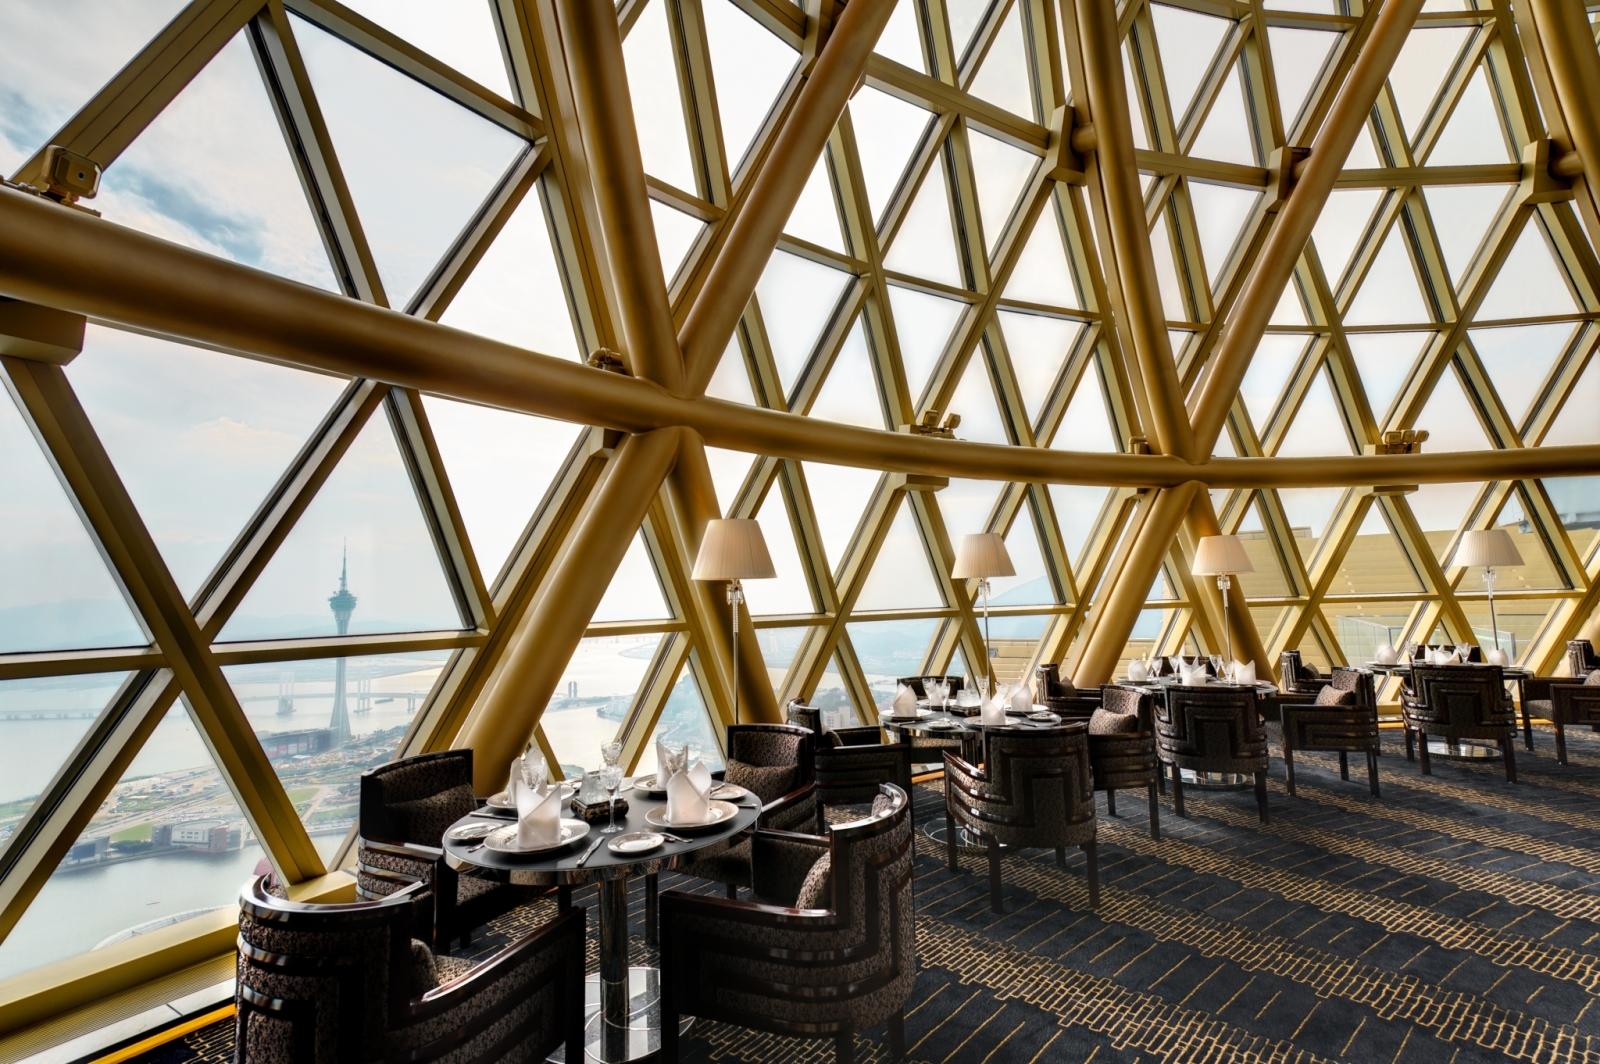 Stars And Spas In Macau Chopstix Amp The City